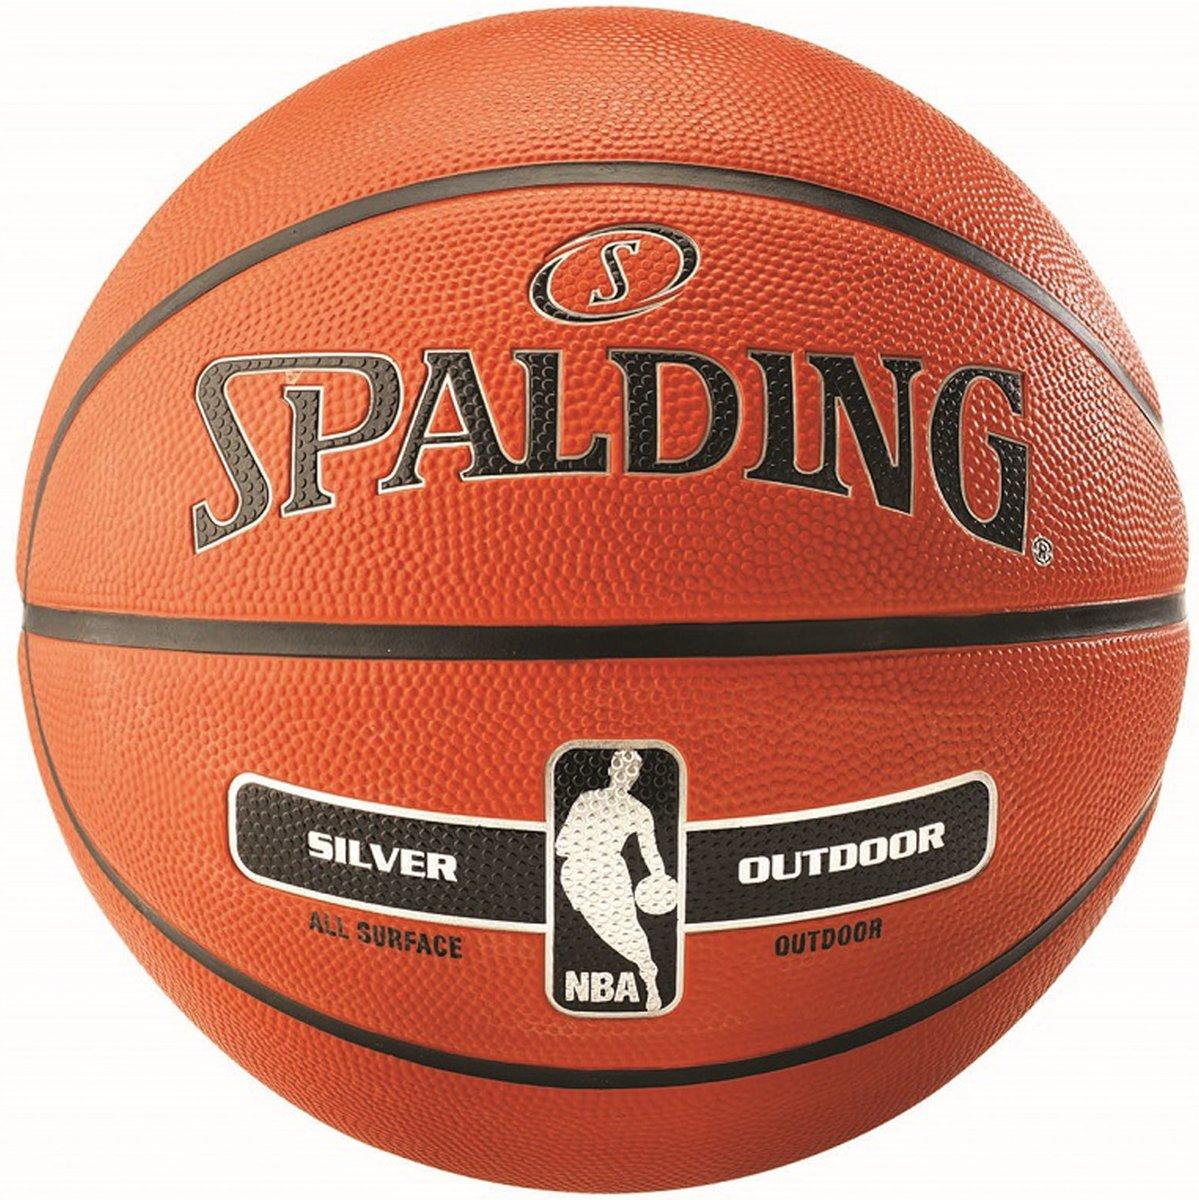 Spalding Basketbal NBA Silver - Maat 5 - Outdoor